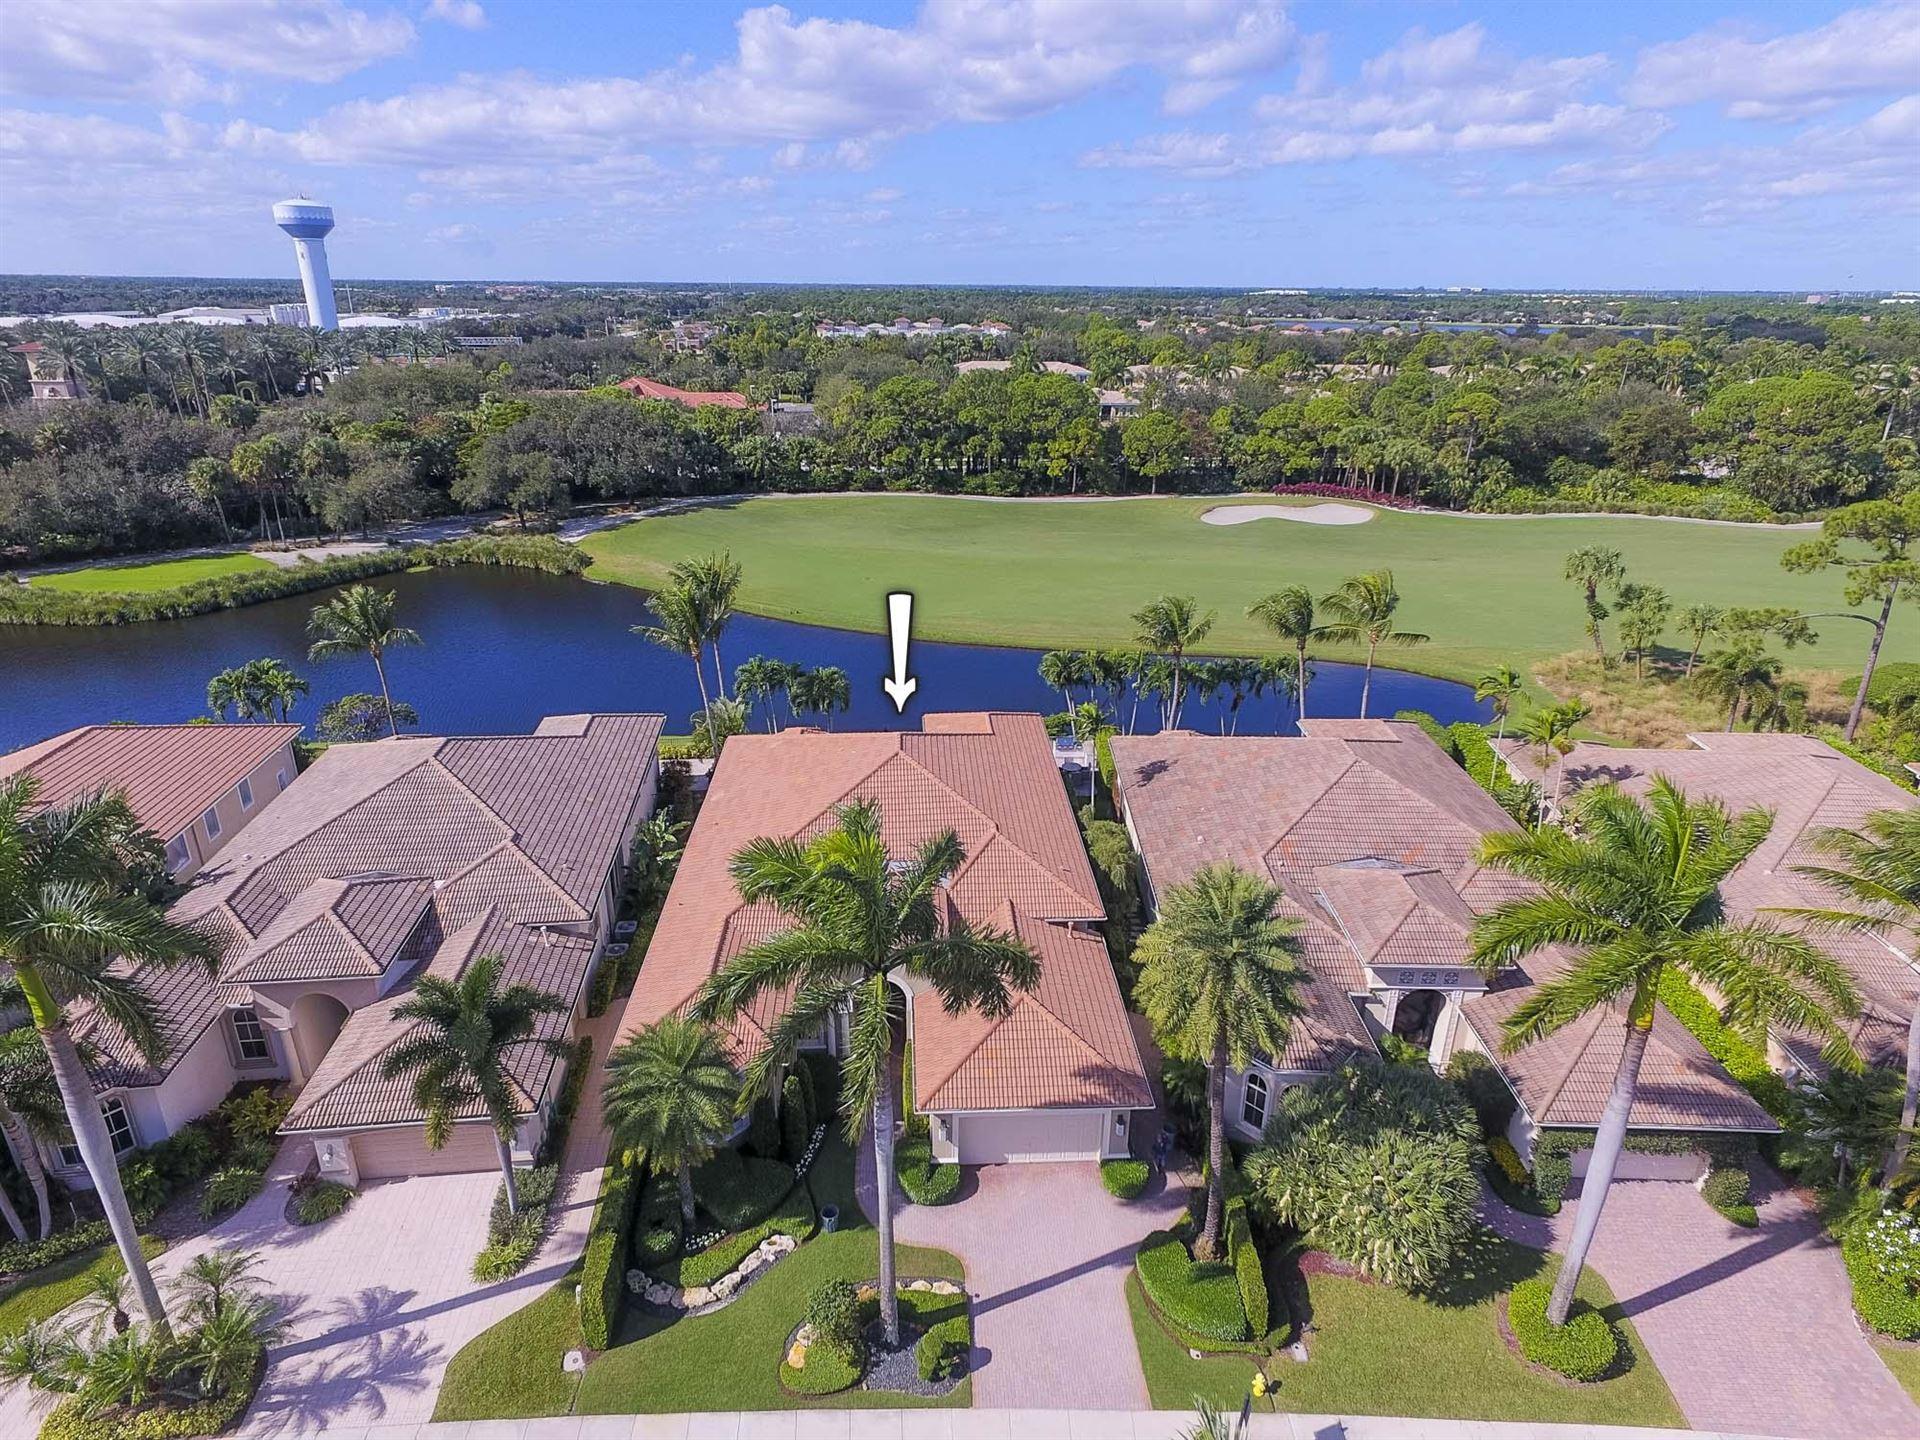 Photo of 121 Abondance Drive, Palm Beach Gardens, FL 33410 (MLS # RX-10672186)